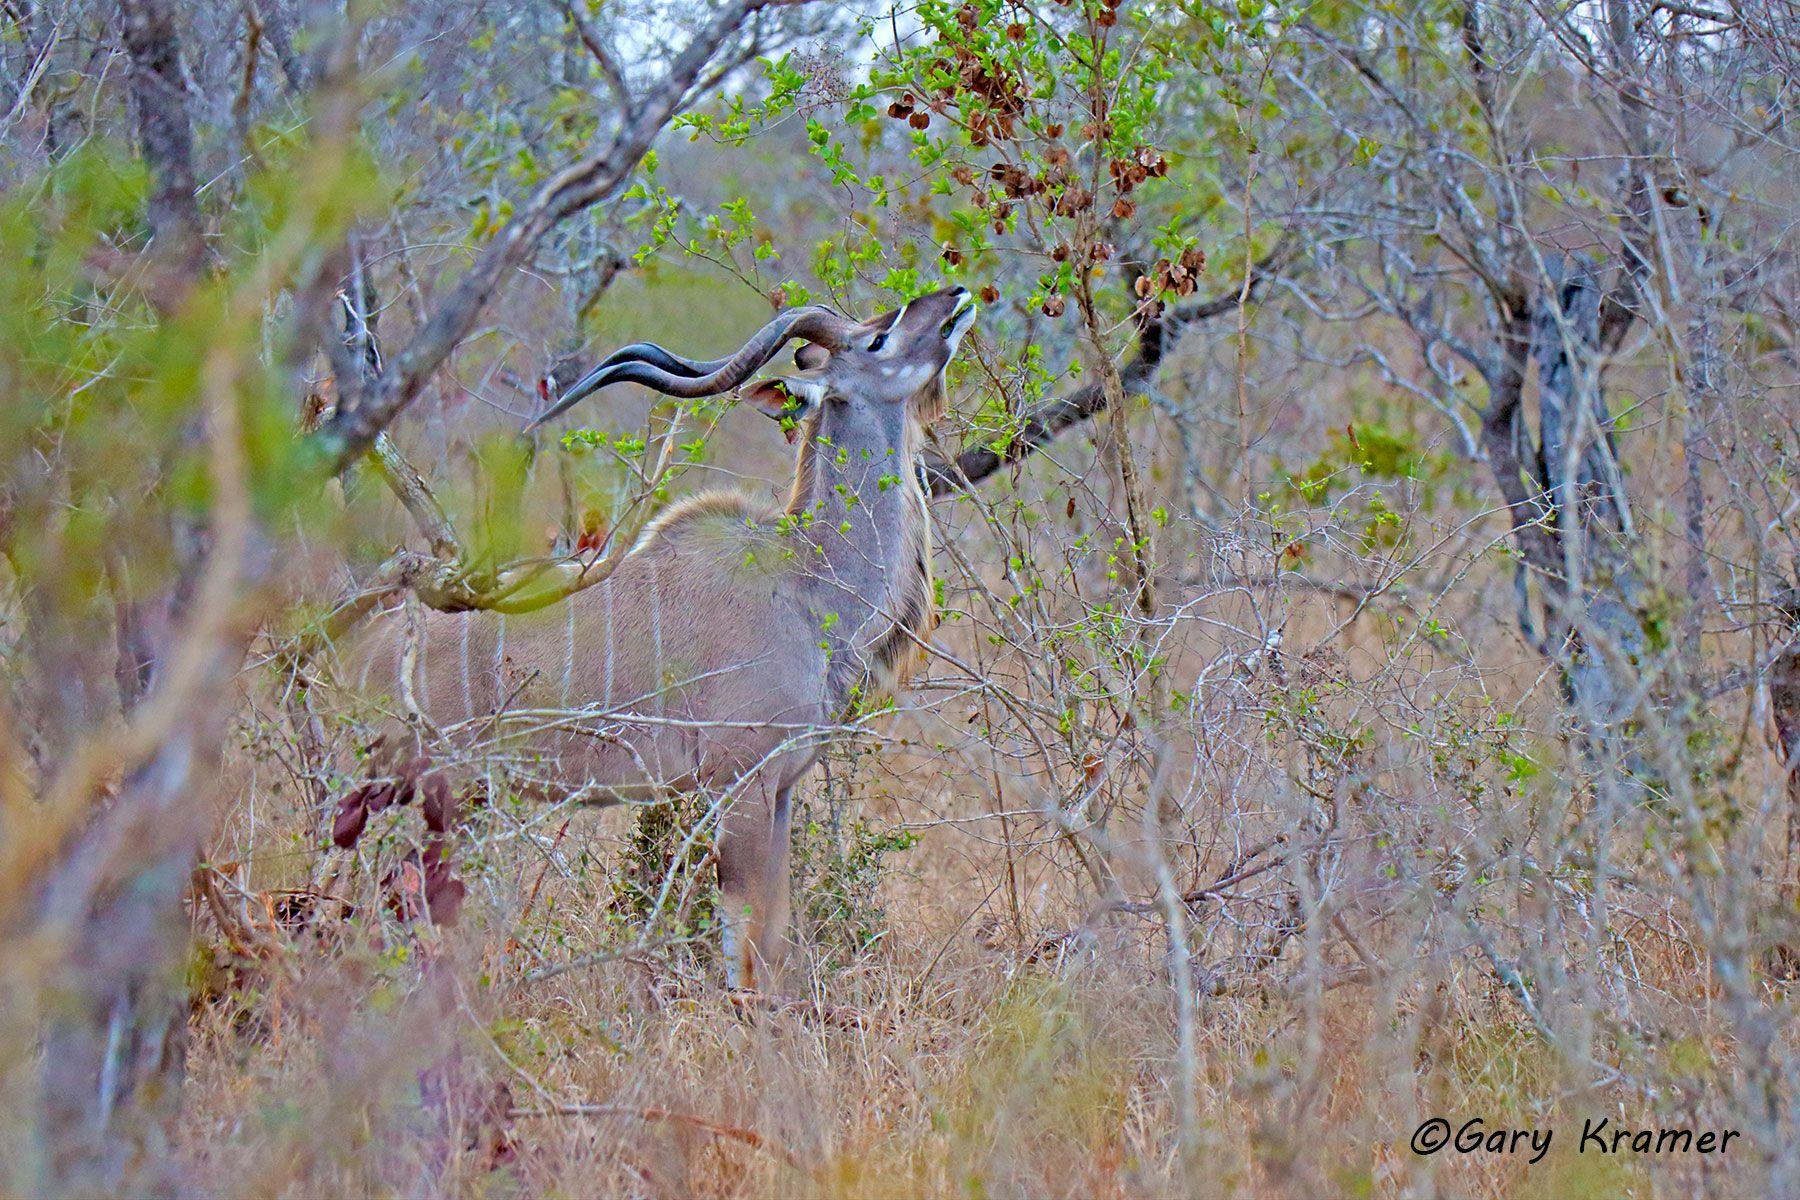 Greater Kudu (Tragelaphus strepsiceros) - AMUK#514d